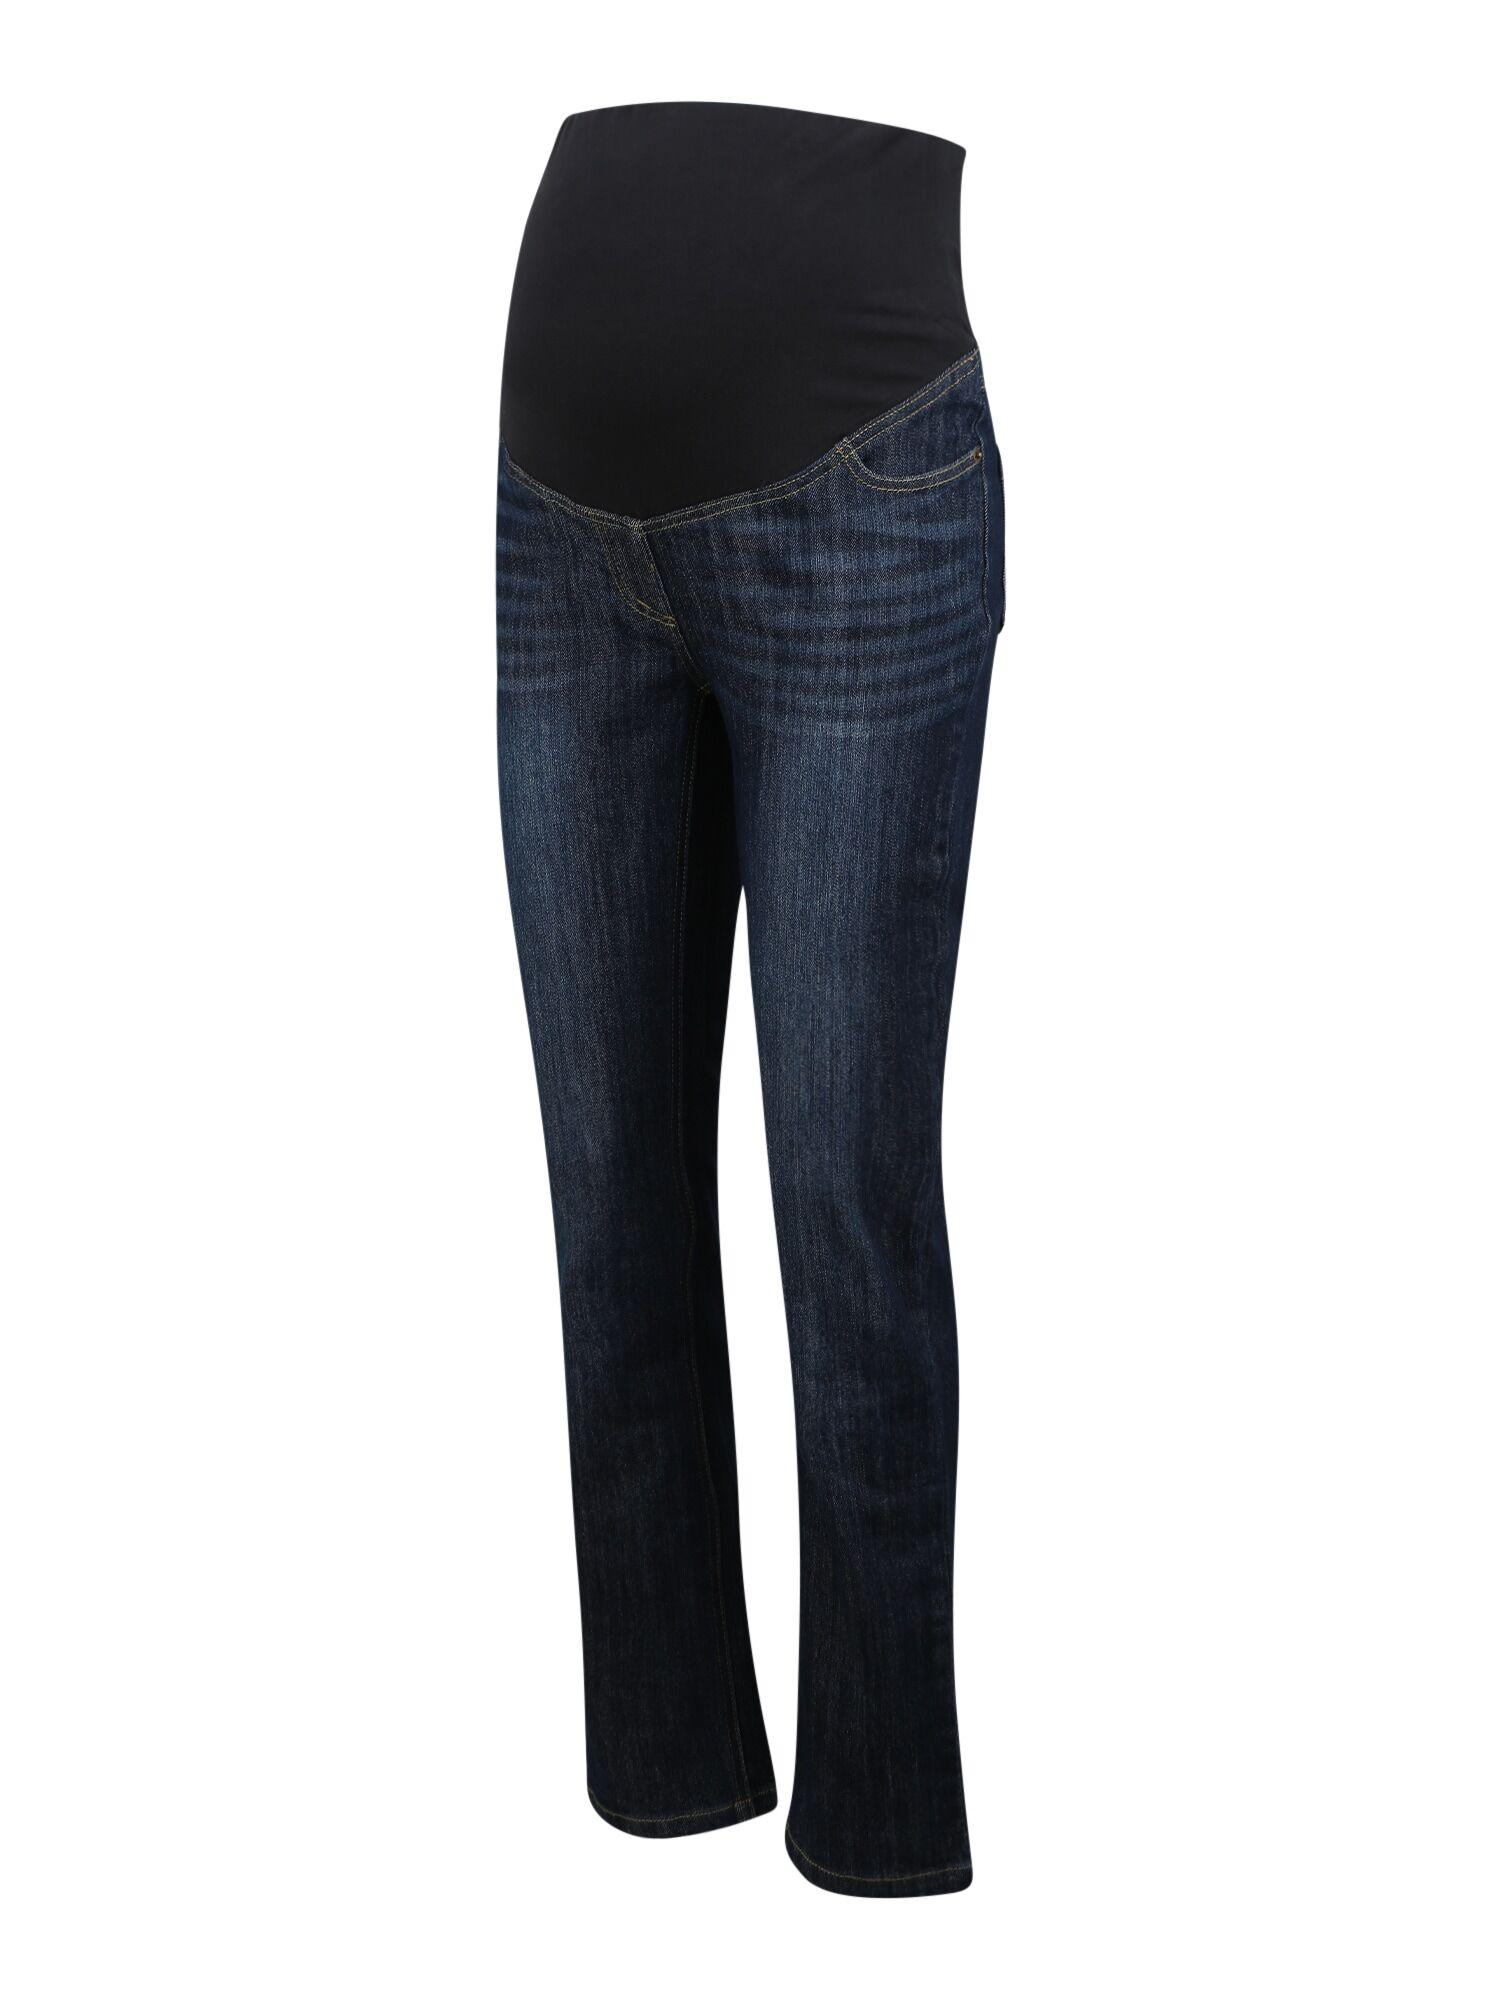 JoJo Maman Bébé Jean  - Bleu - Taille: 38 - female